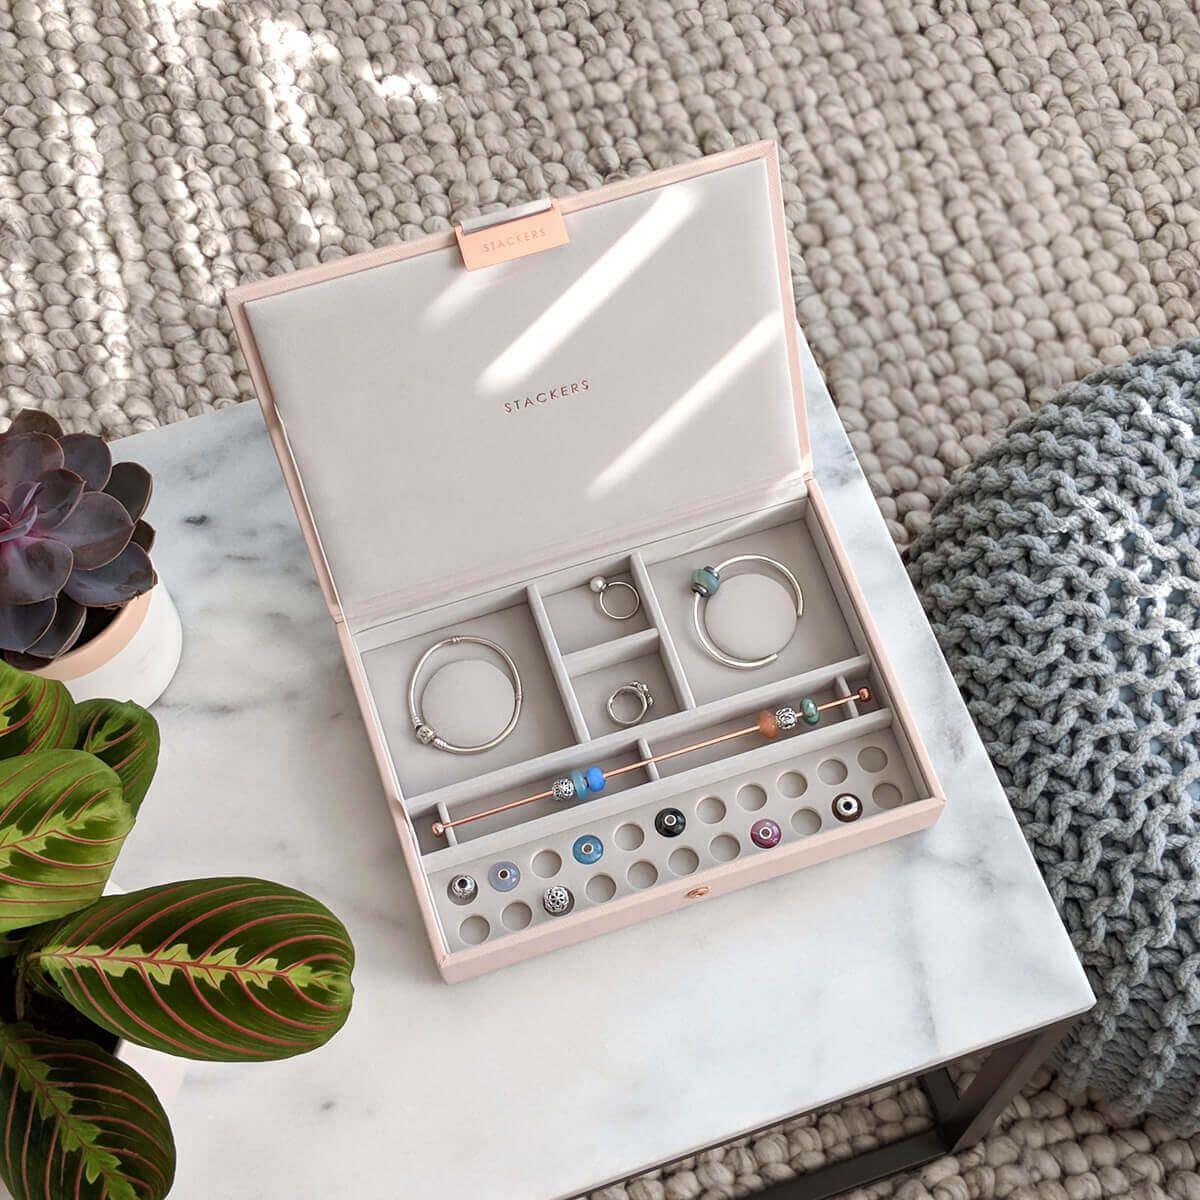 Stackers Sperkovnice Classic Limited Blush Charm Lidded Ruzova Pandora Jewelry Box Jewelry Organizer Box Stackers Jewellery